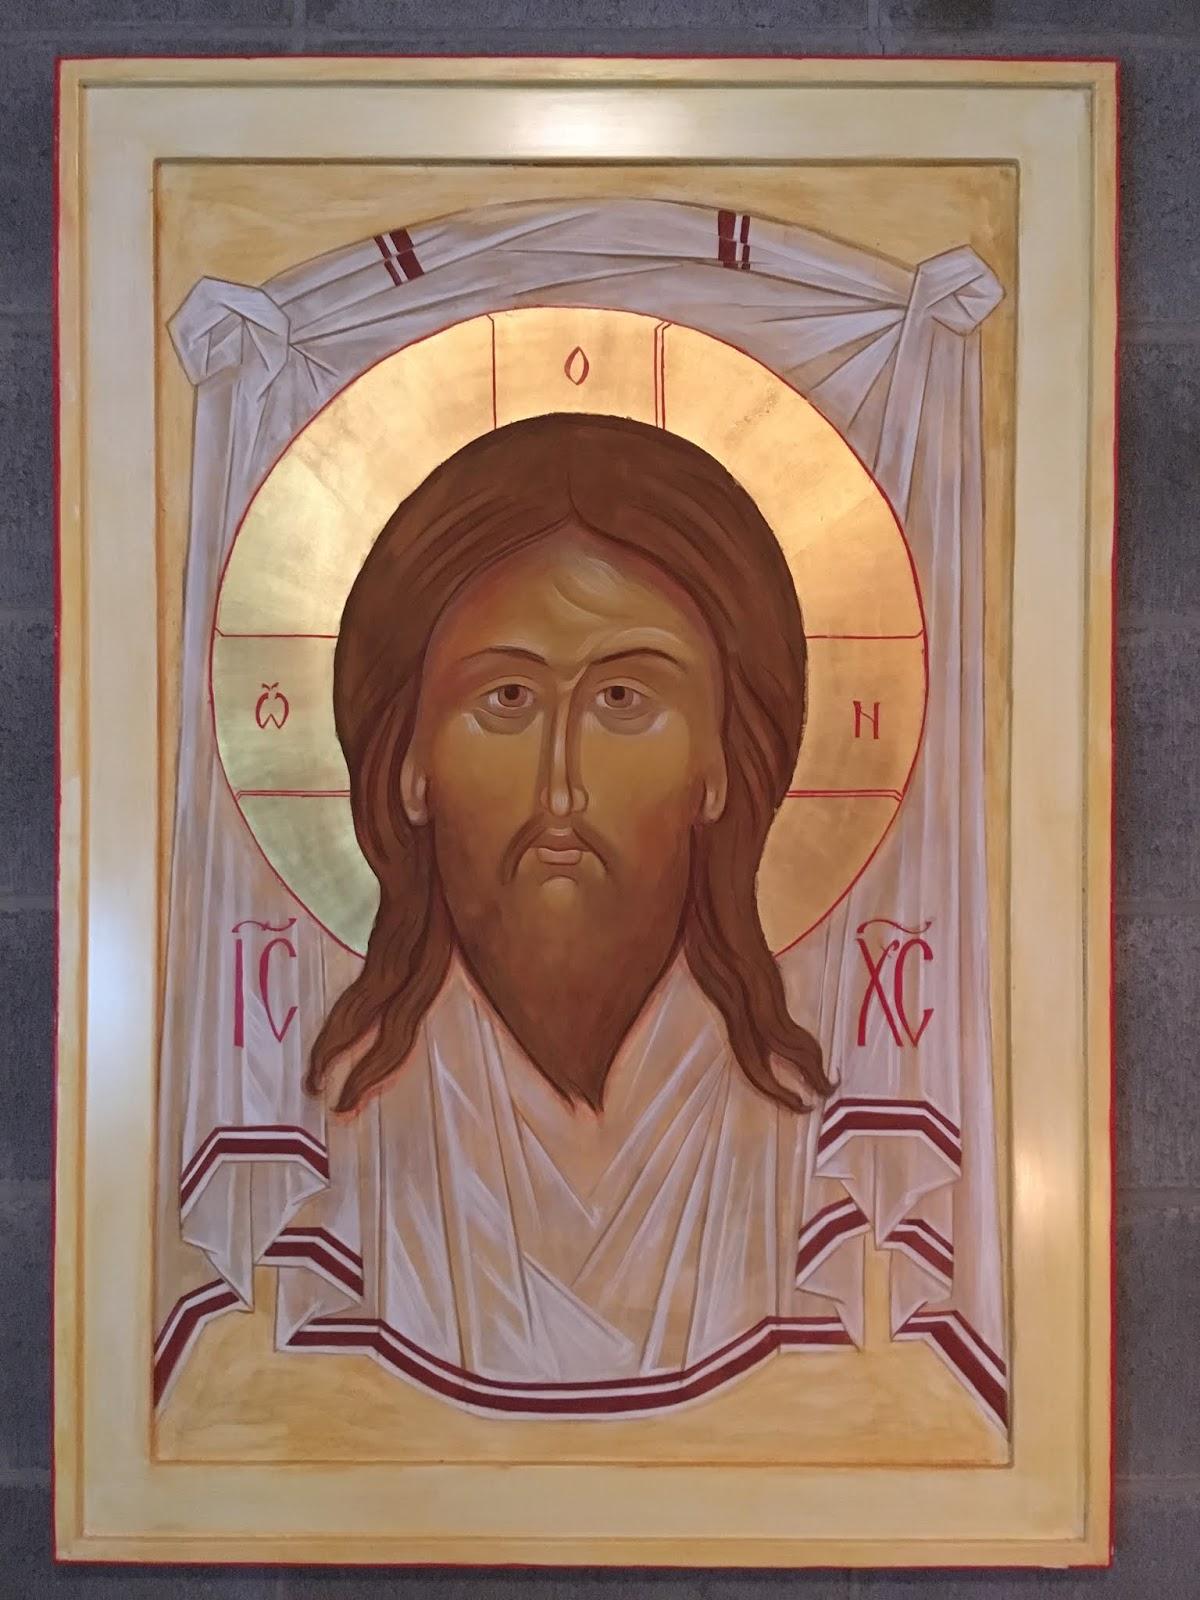 Saint Josephine Bakhita (1869-1947); Saint Jerome Emiliani (1486-1537)